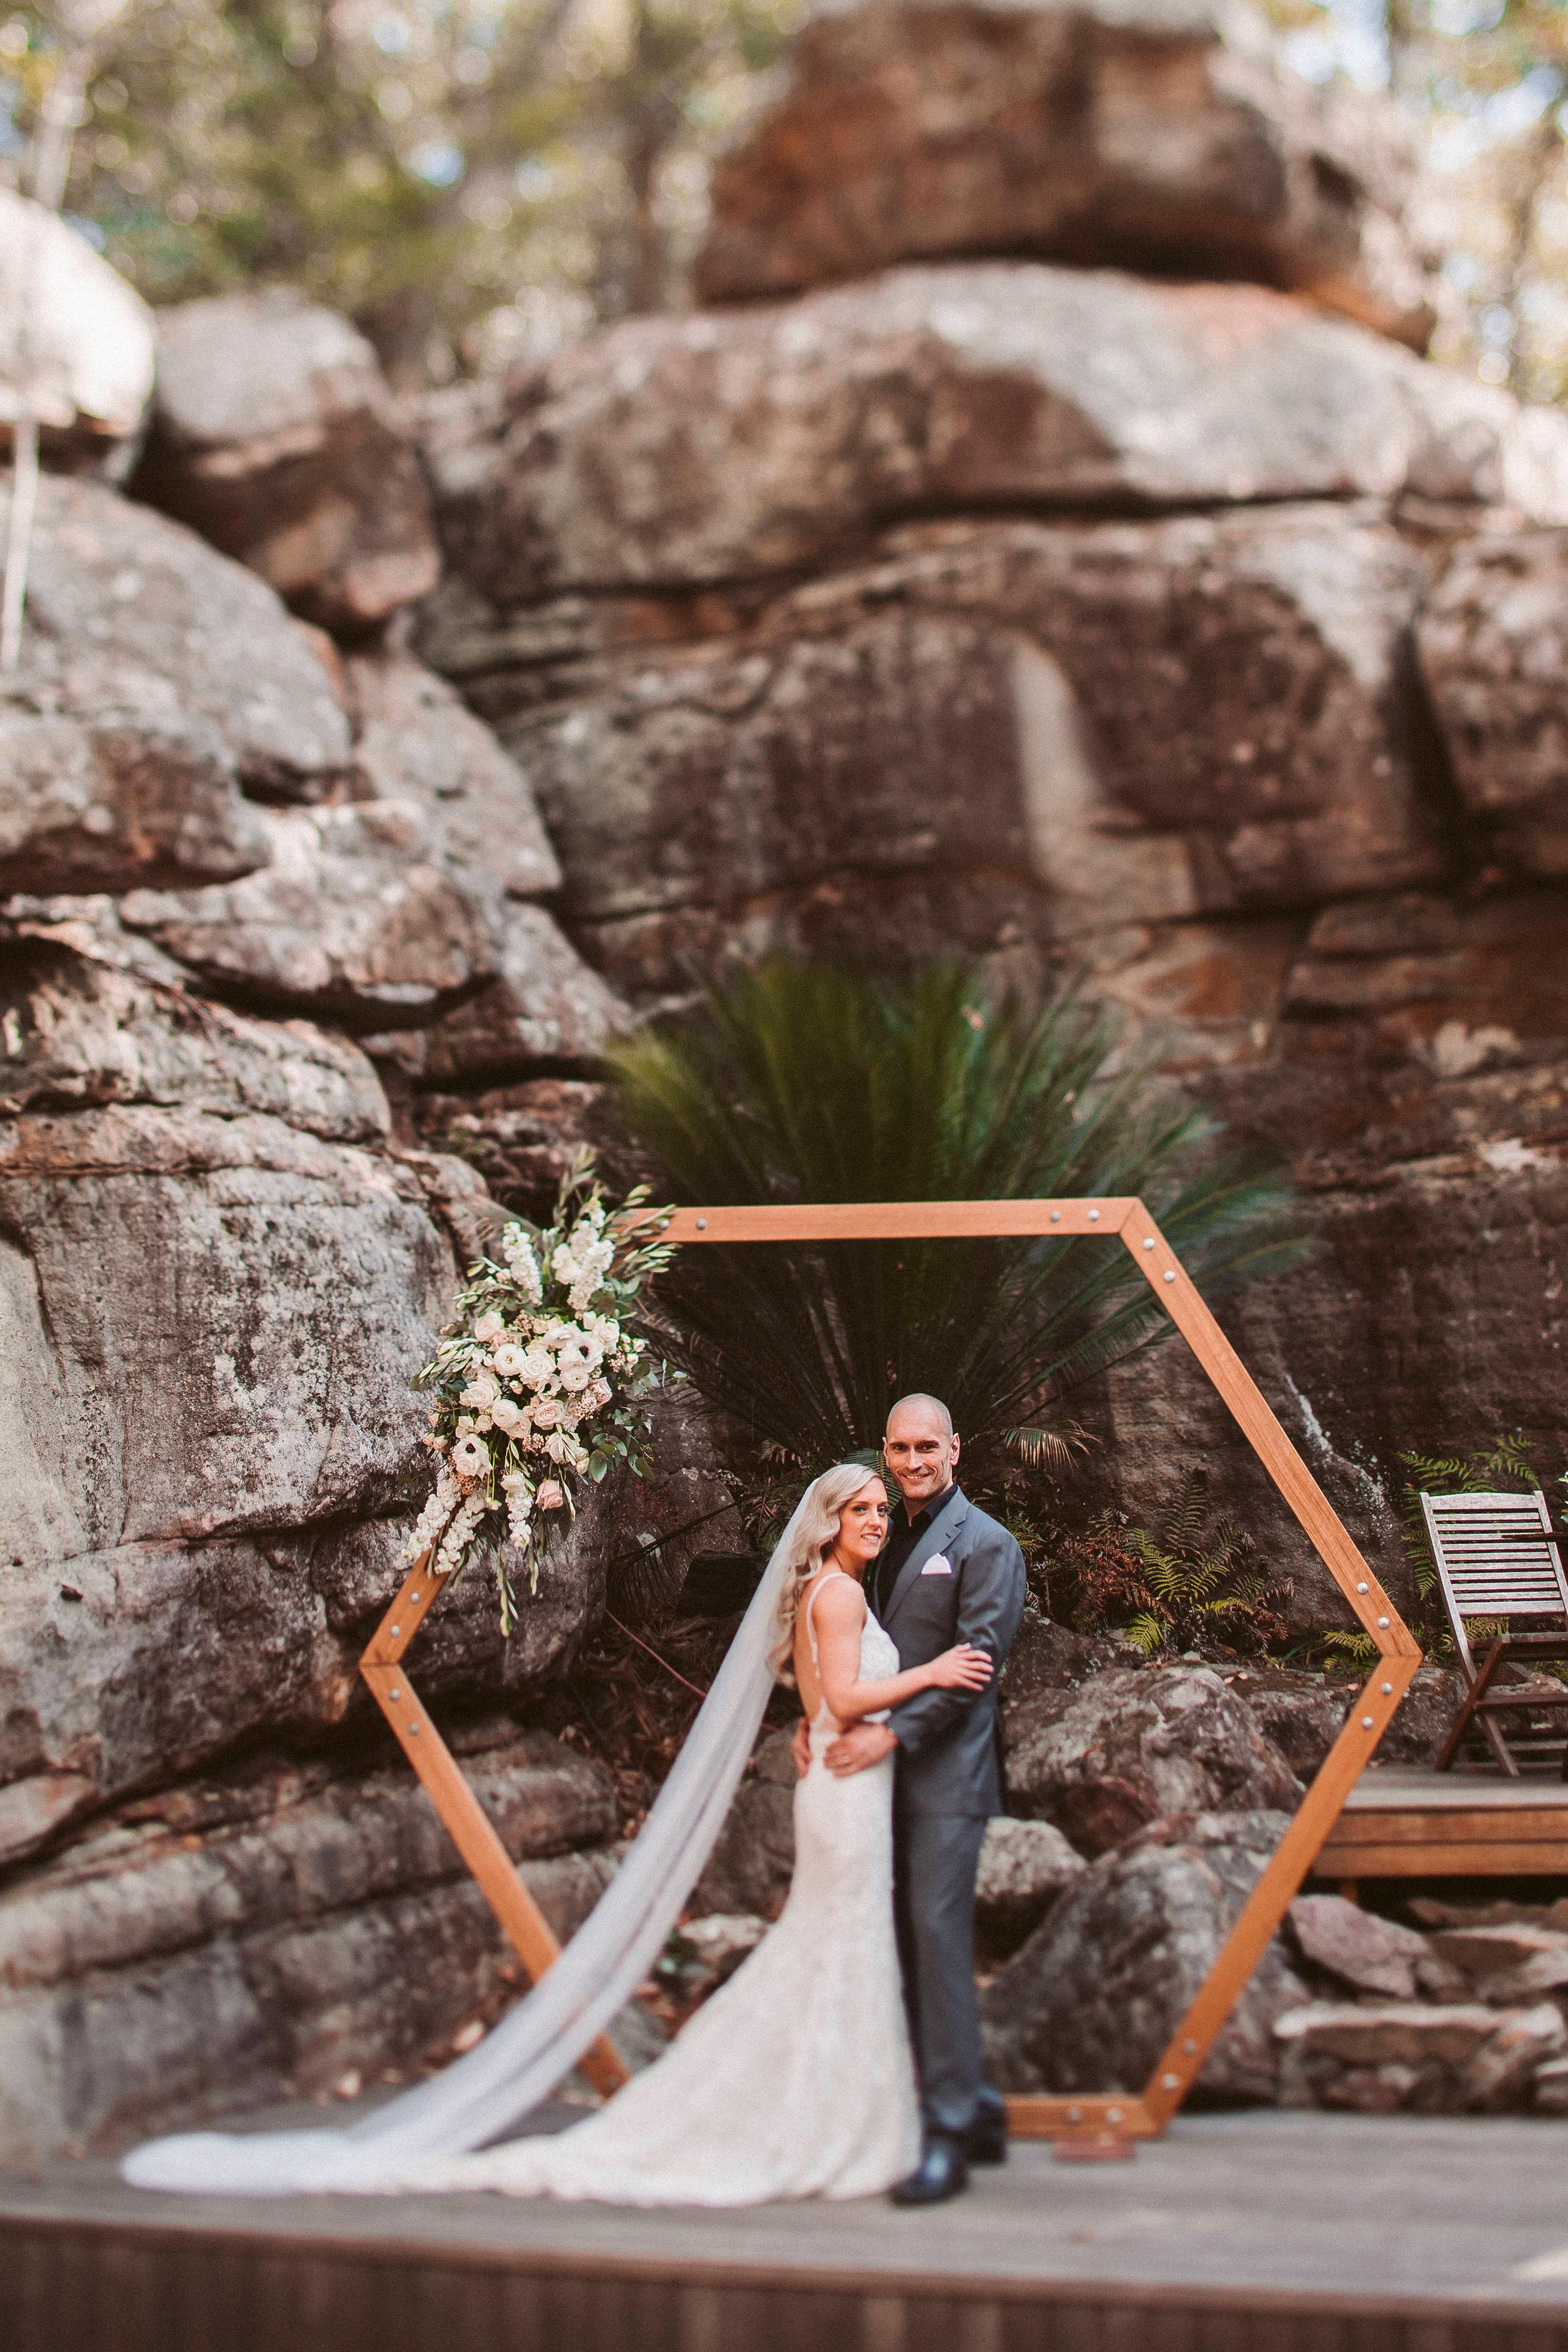 Boho Rustic Wedding Decor